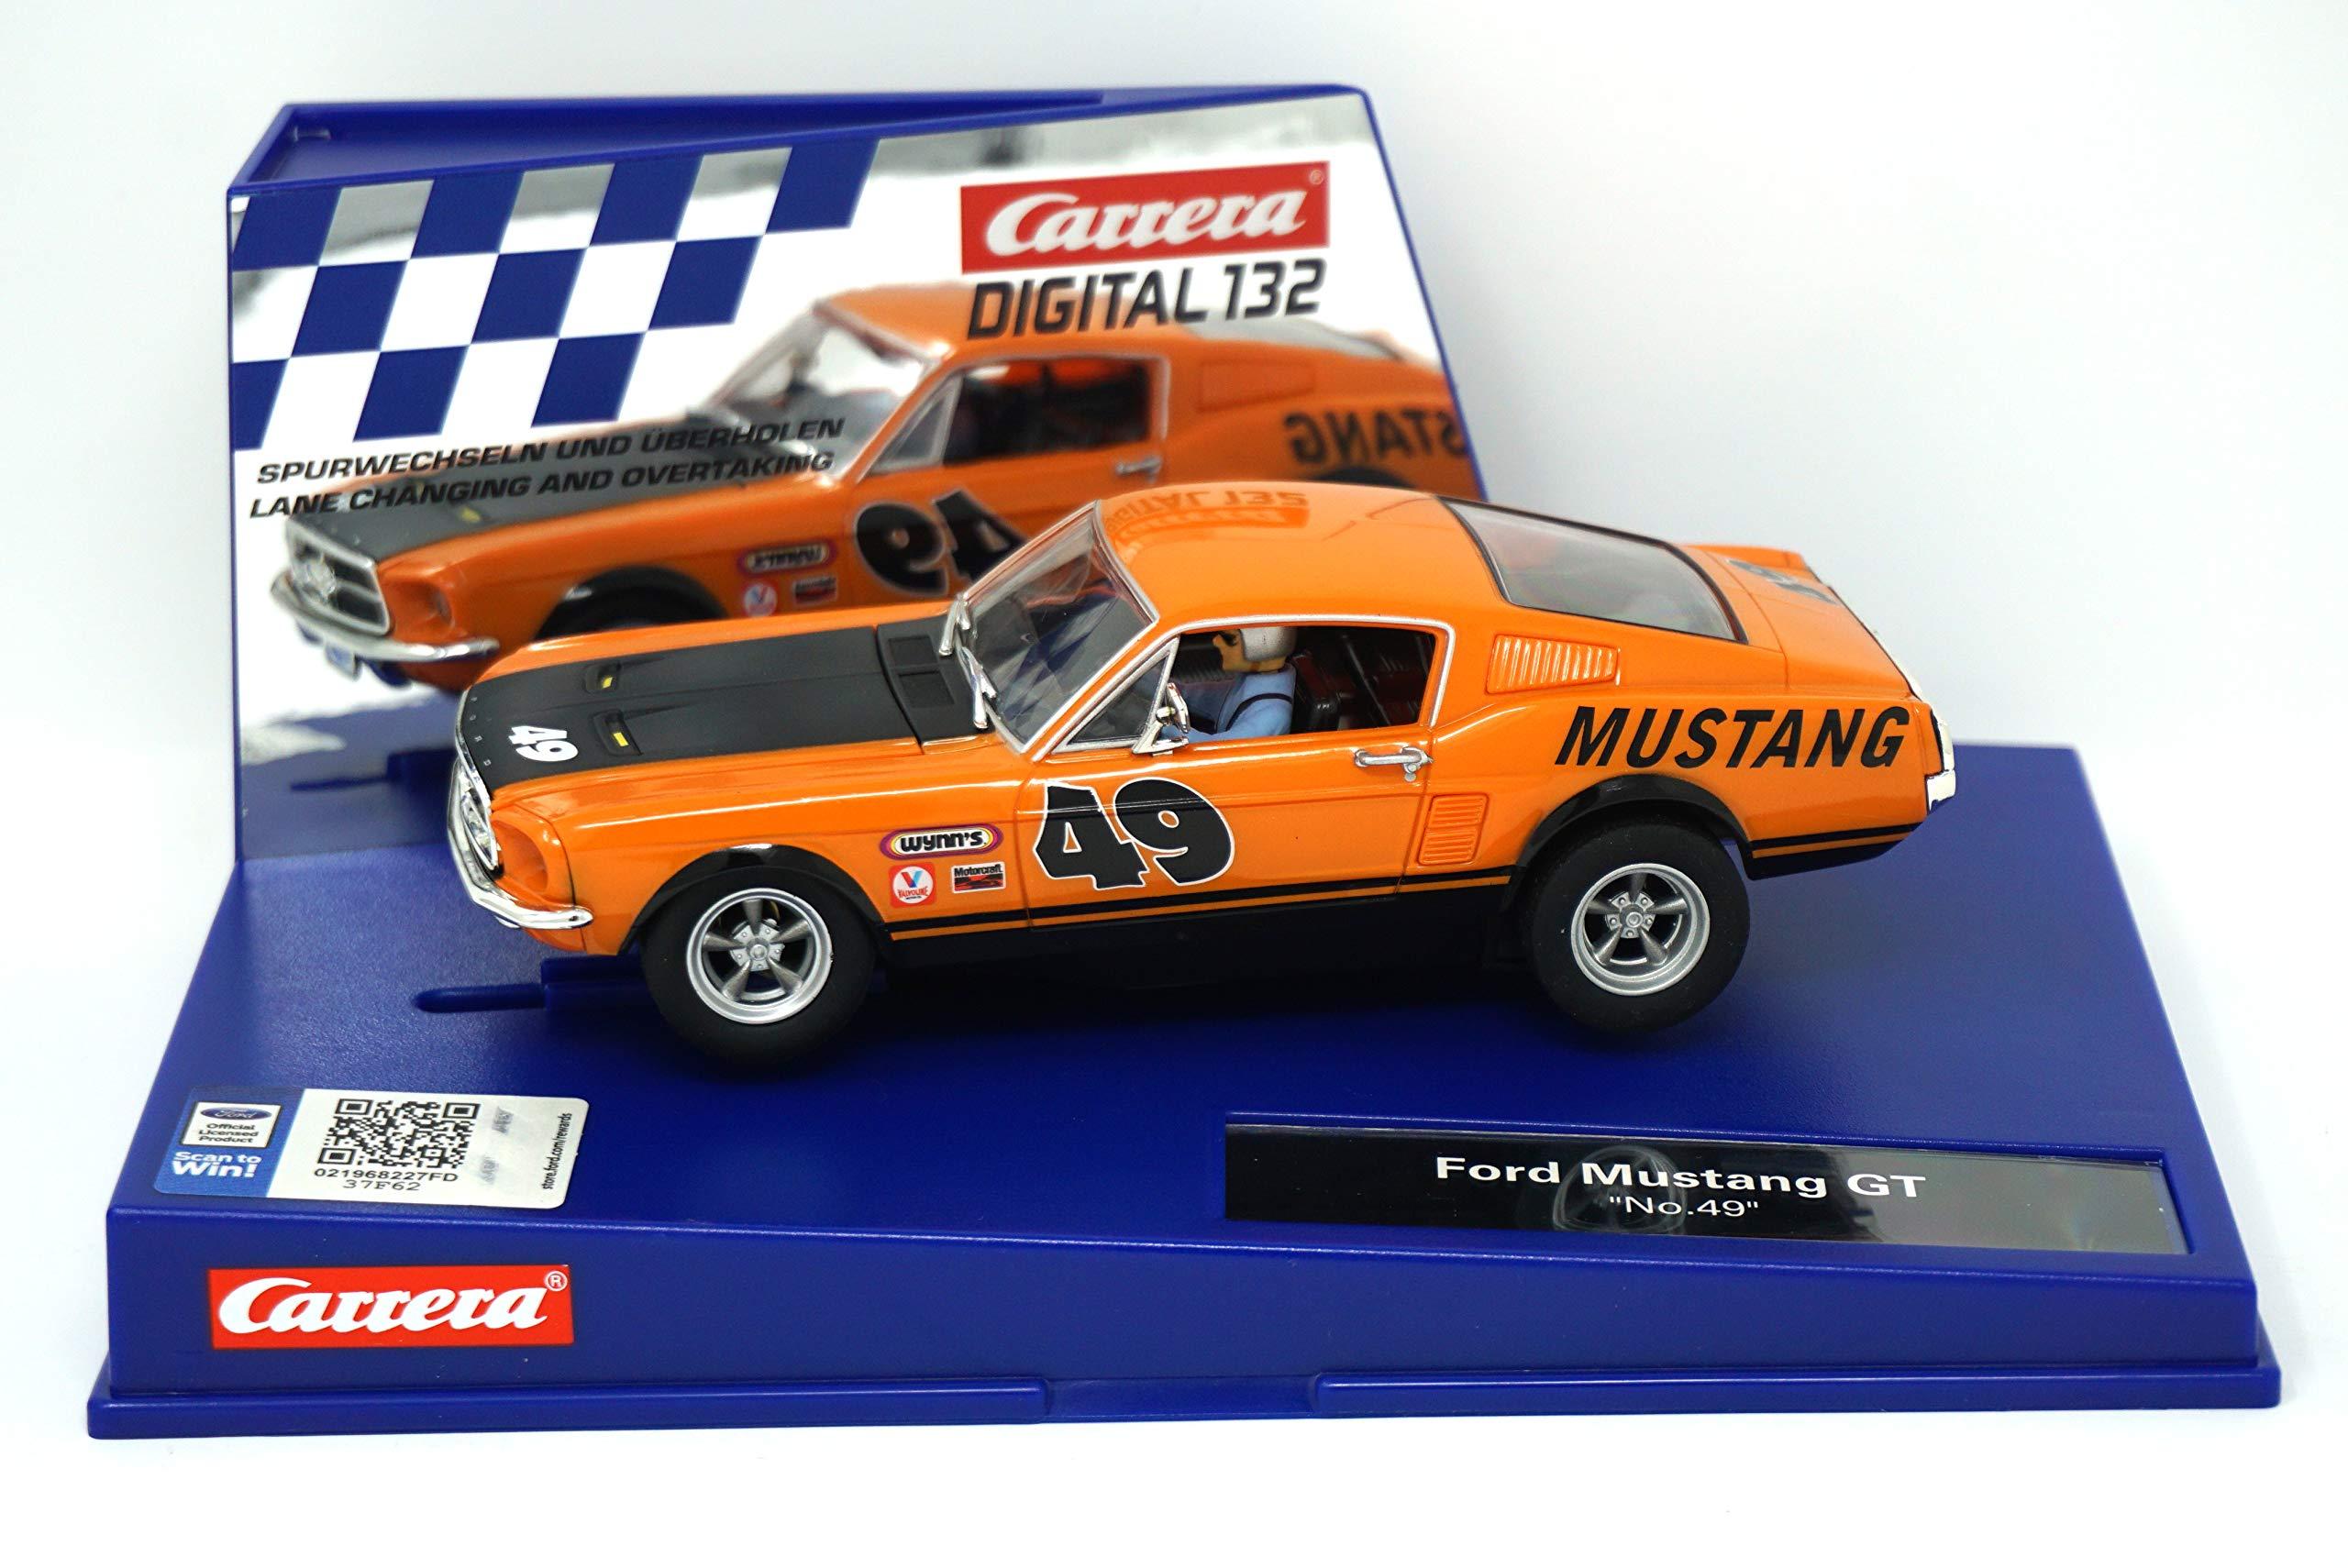 30722 Carrera Digital 132 Ford Mustang GT #49